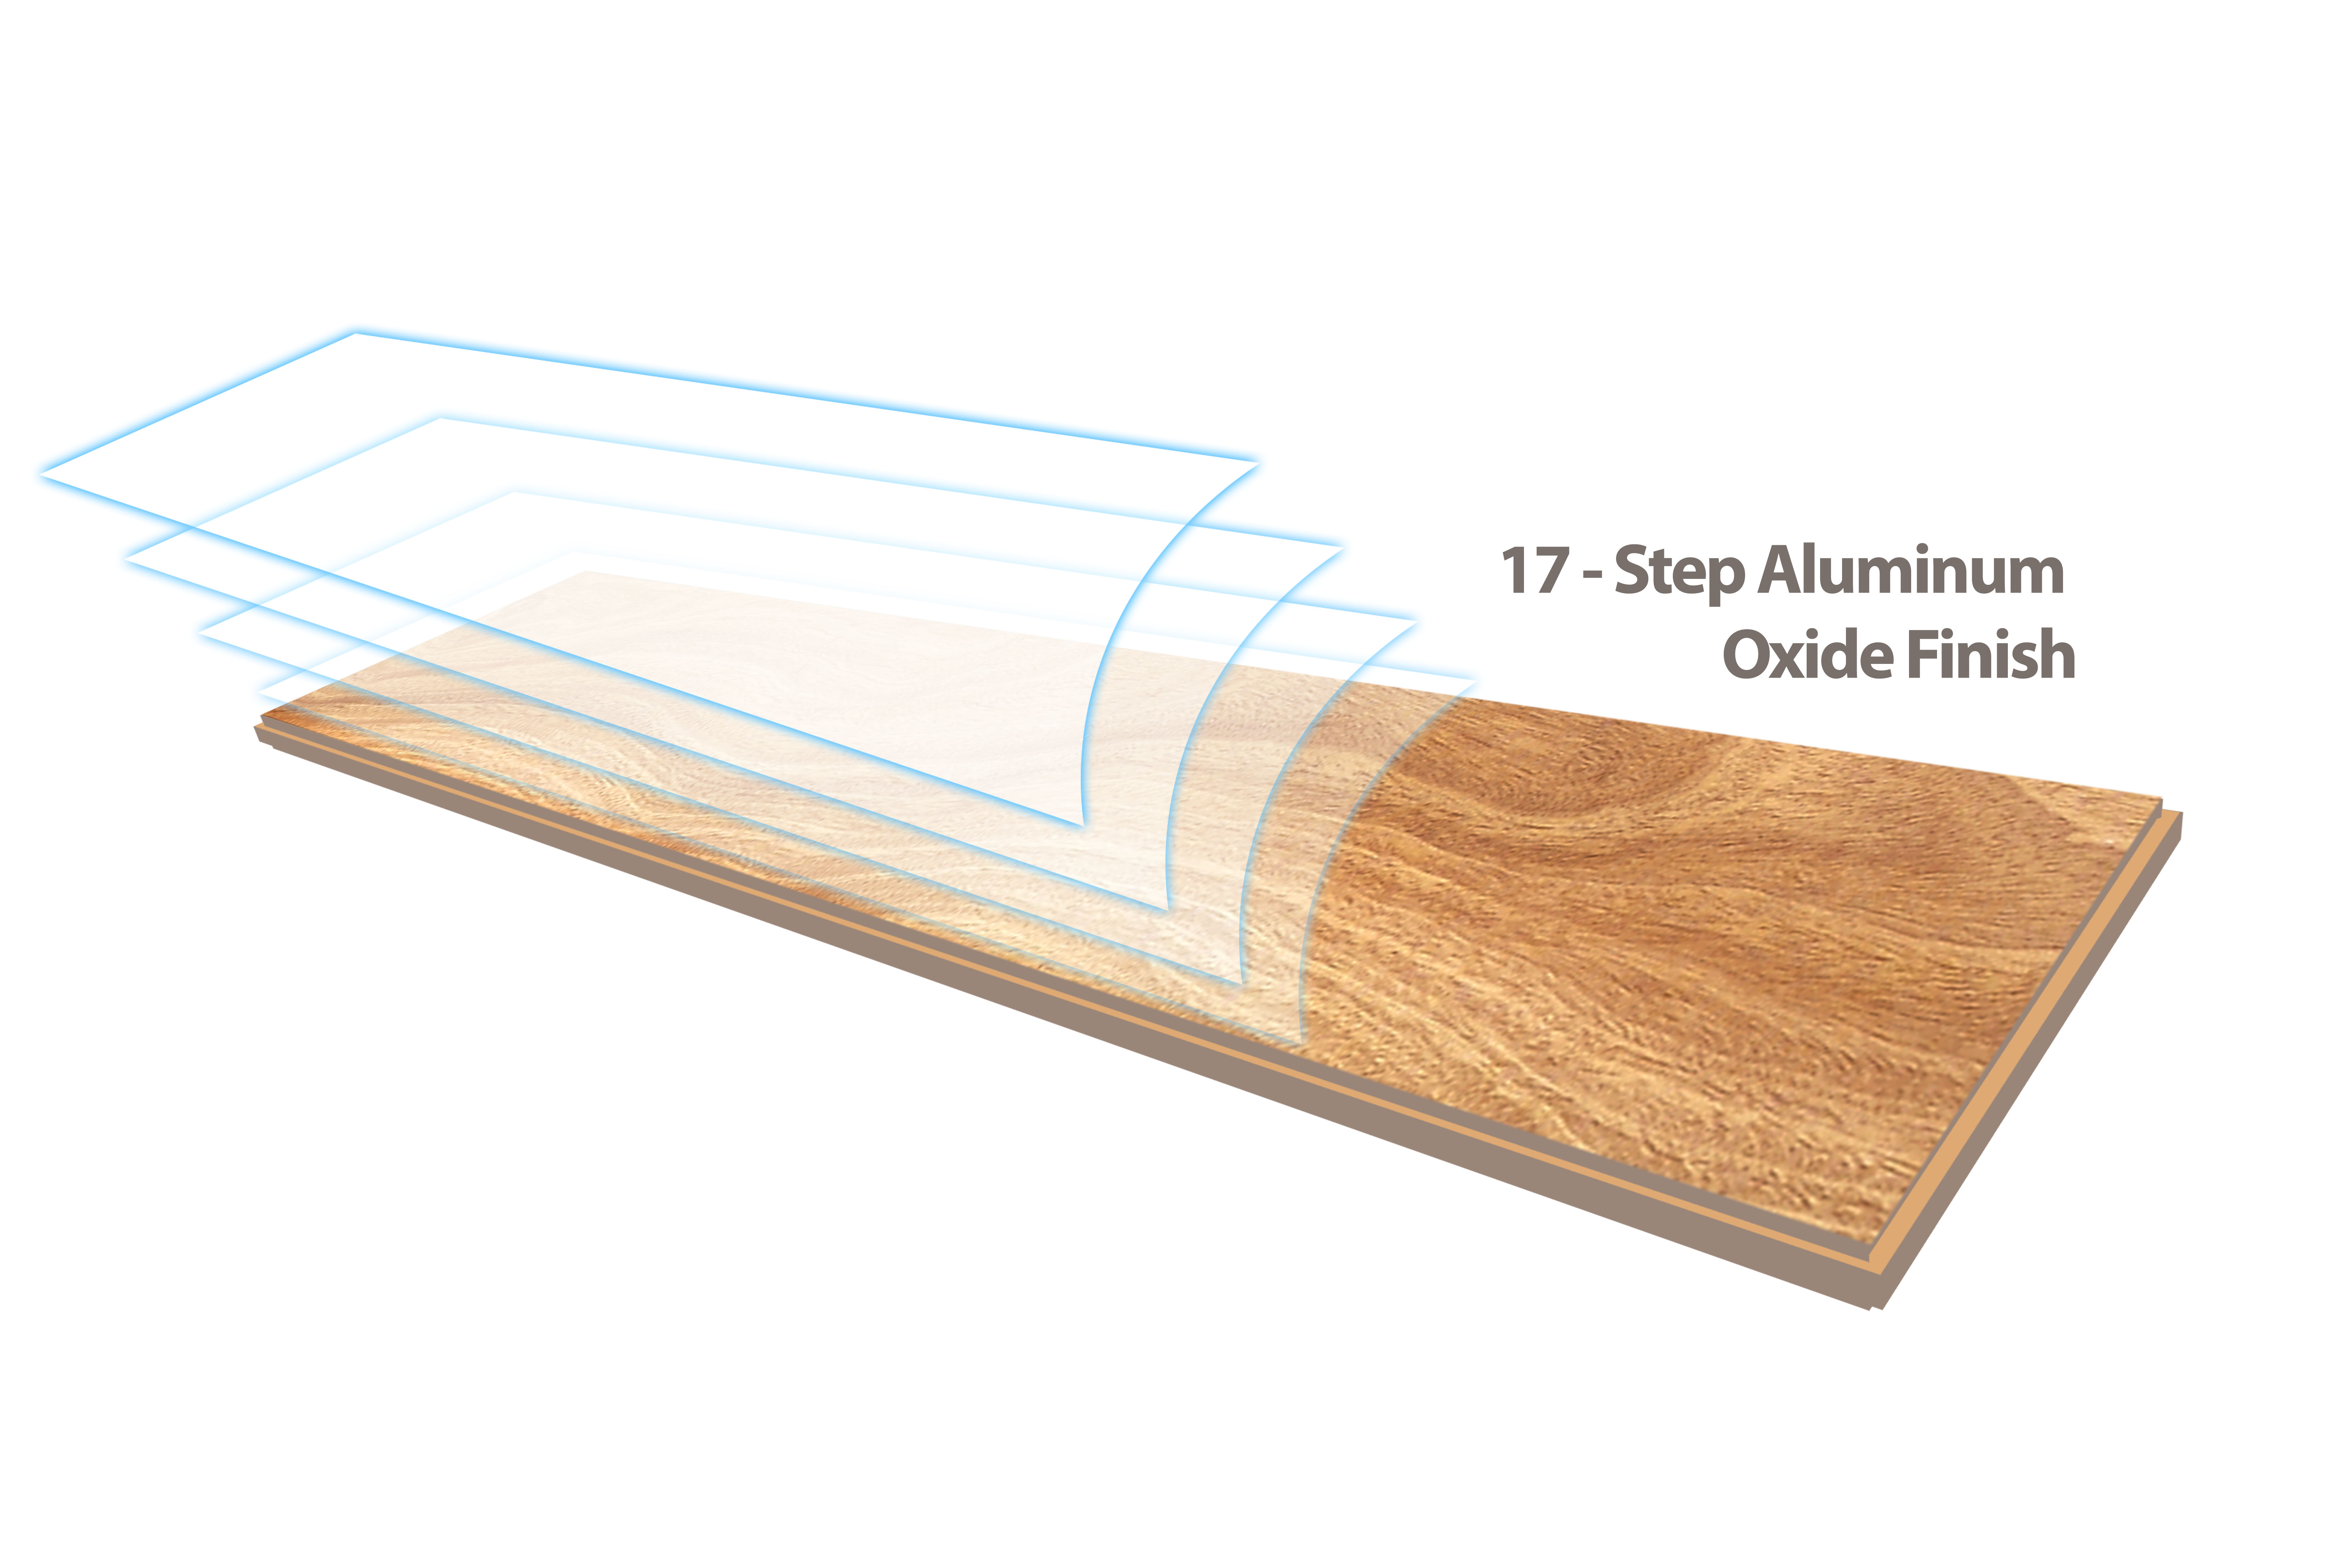 Aluminum Oxide Finish Wood Aluminum Oxide Finish